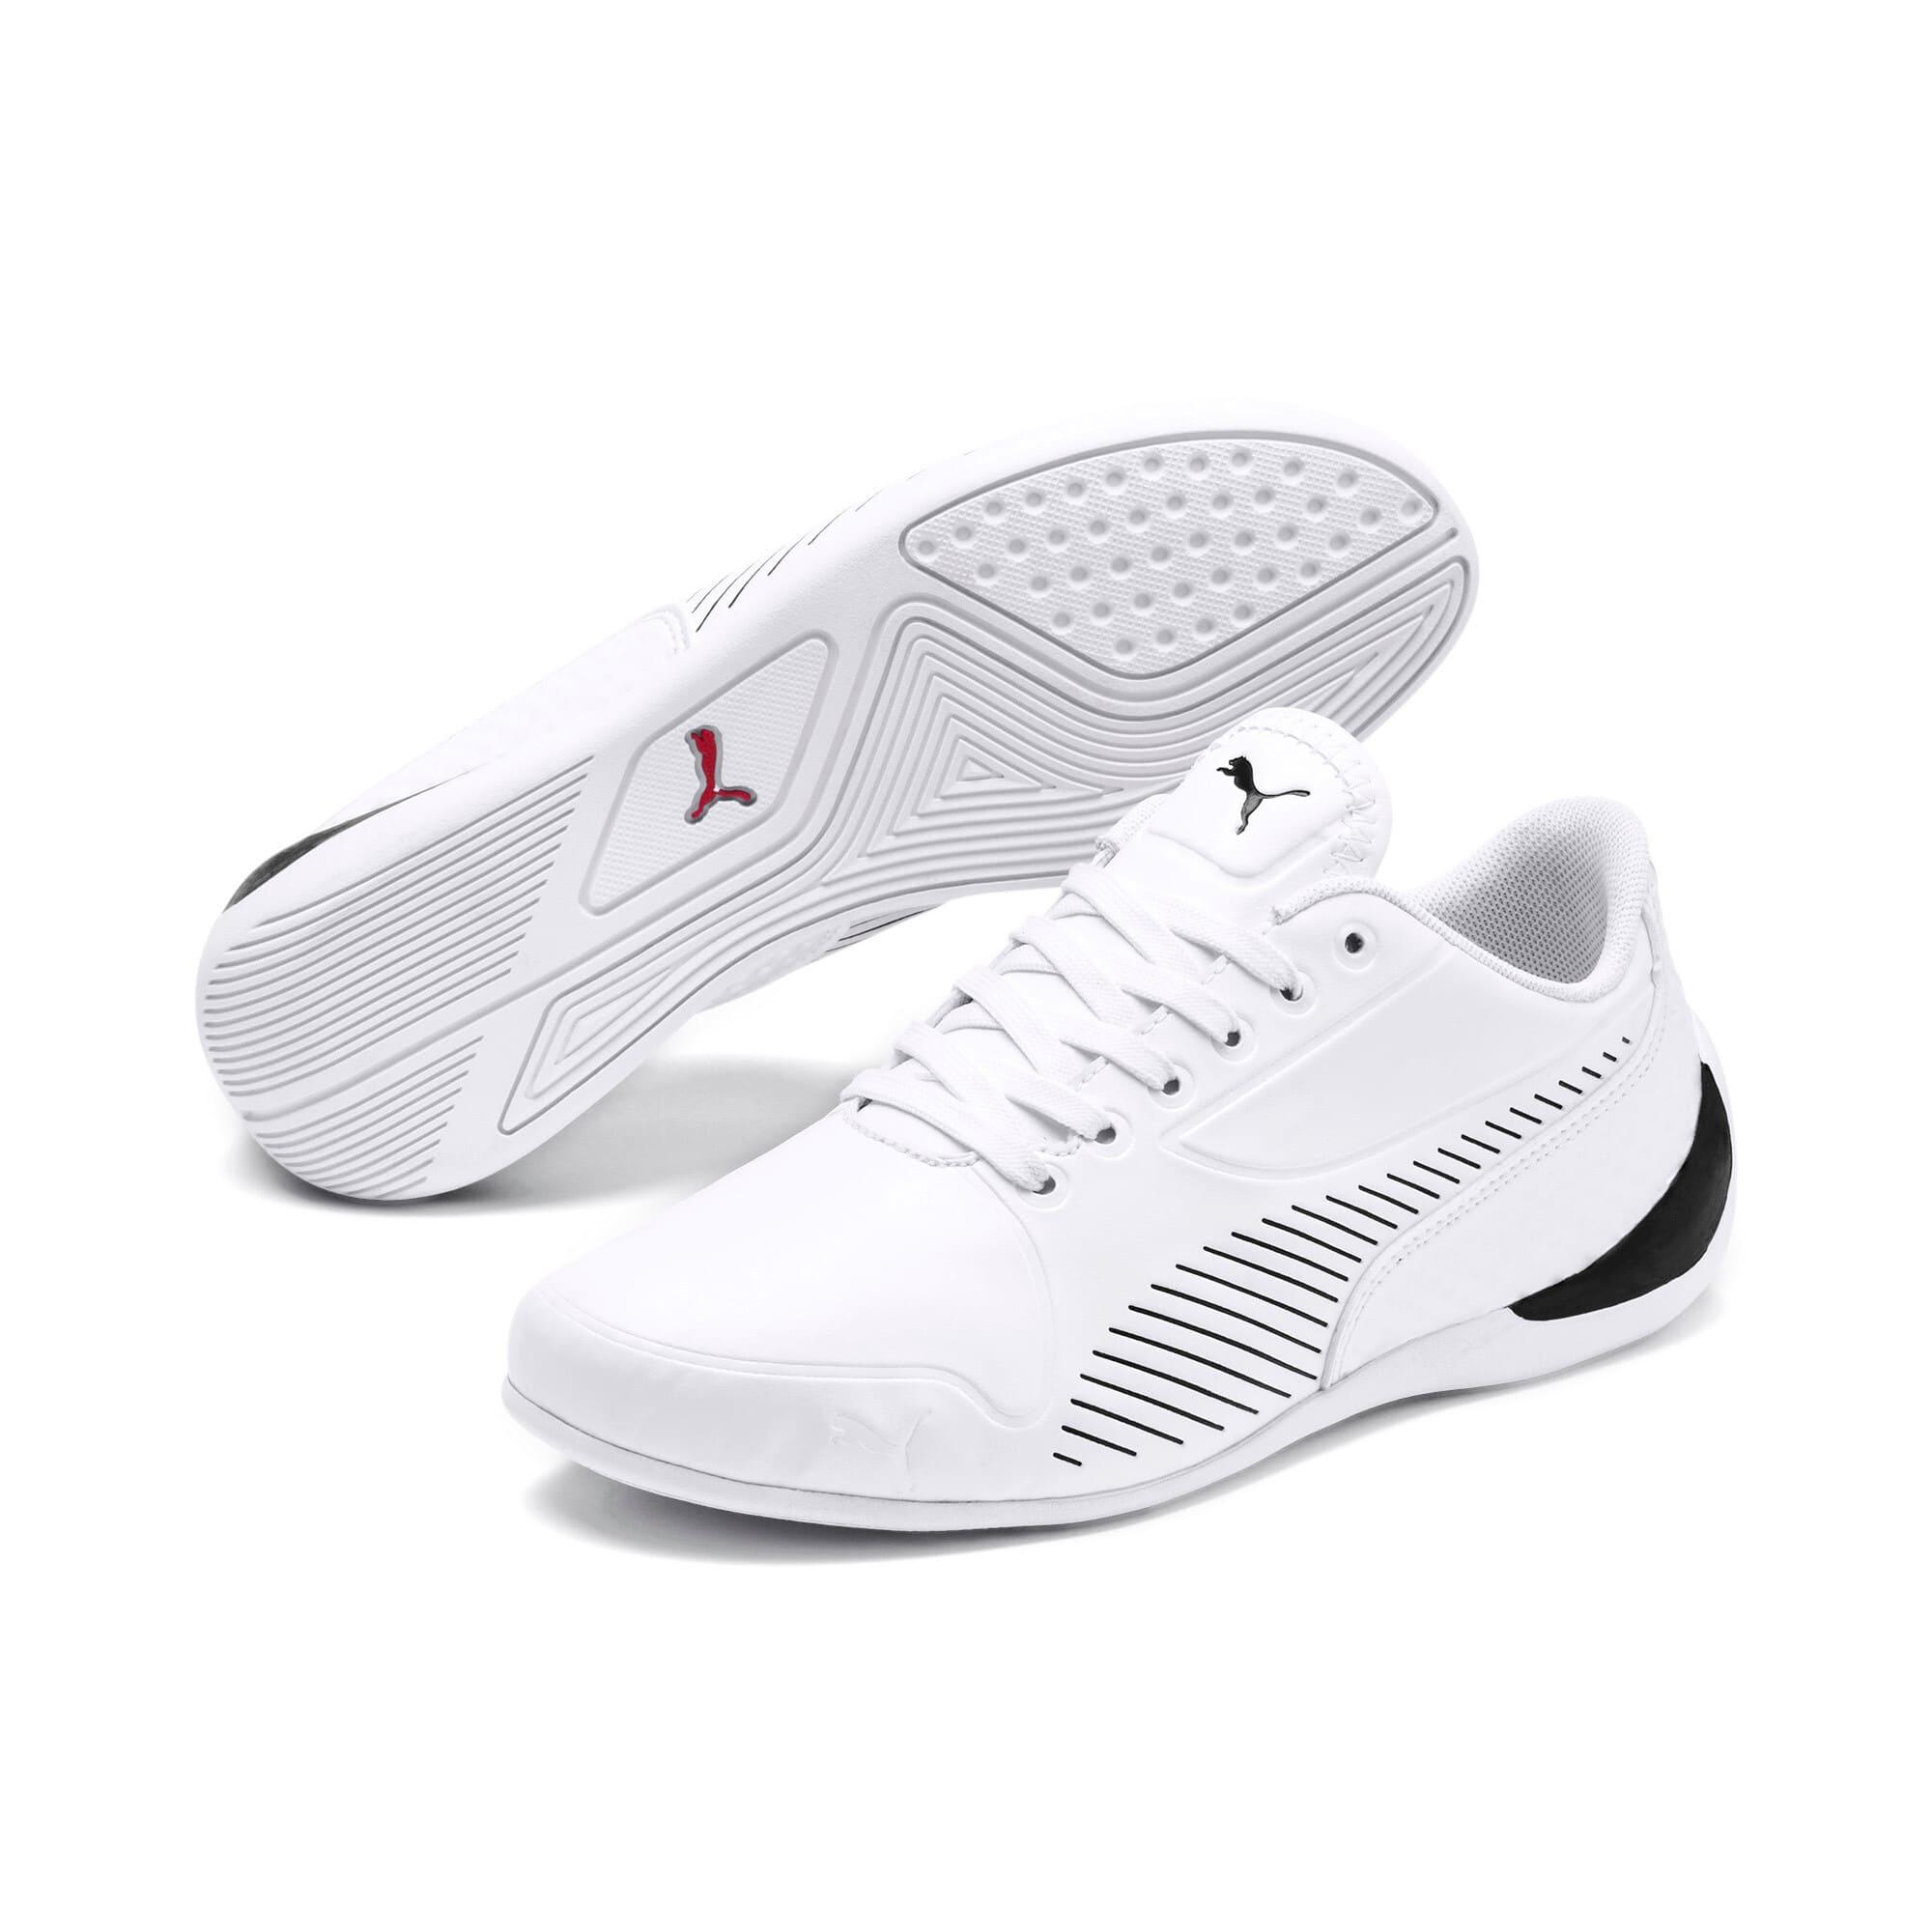 Thumbnail 2 of Ferrari Drift Cat 7S Ultra Youth Sneaker, Puma White-Puma Black, medium